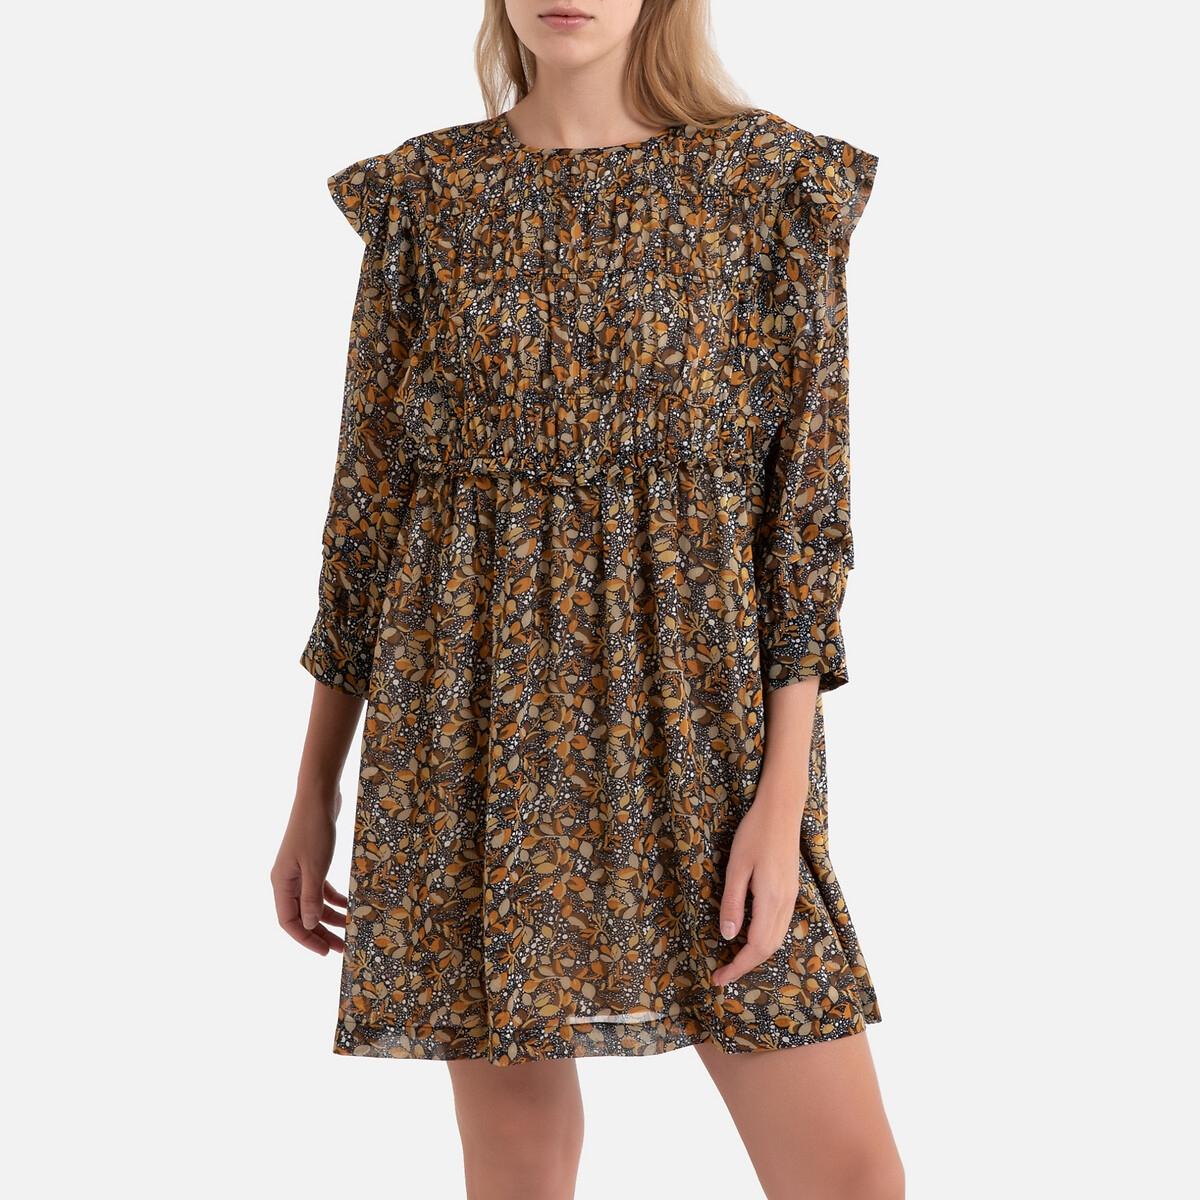 Платье La Redoute Короткое с принтом и рукавами SANDRA 1(S) каштановый платье la redoute с принтом chora 1 s другие